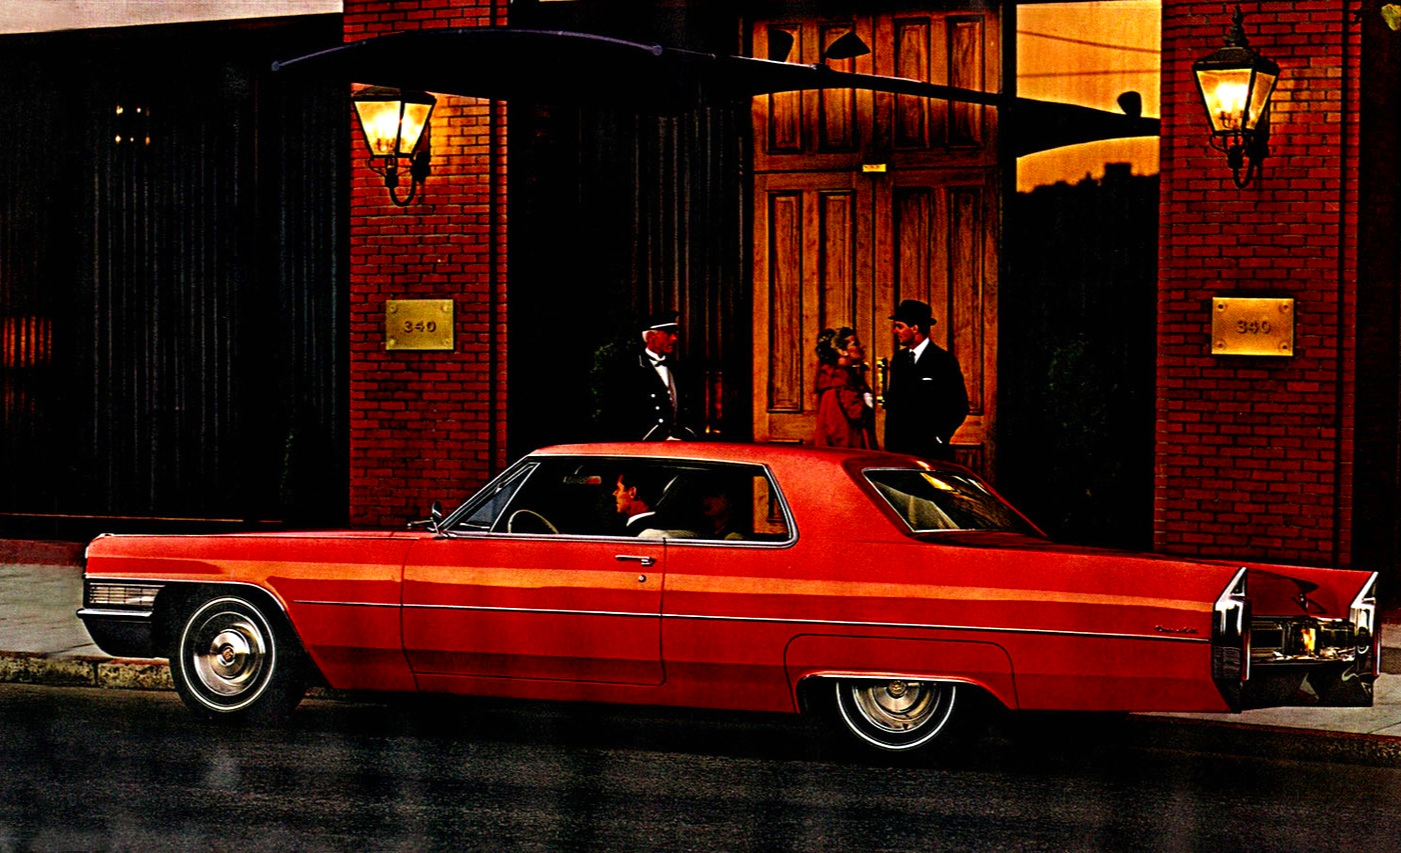 TunnelRam_Cadillac (11).jpg